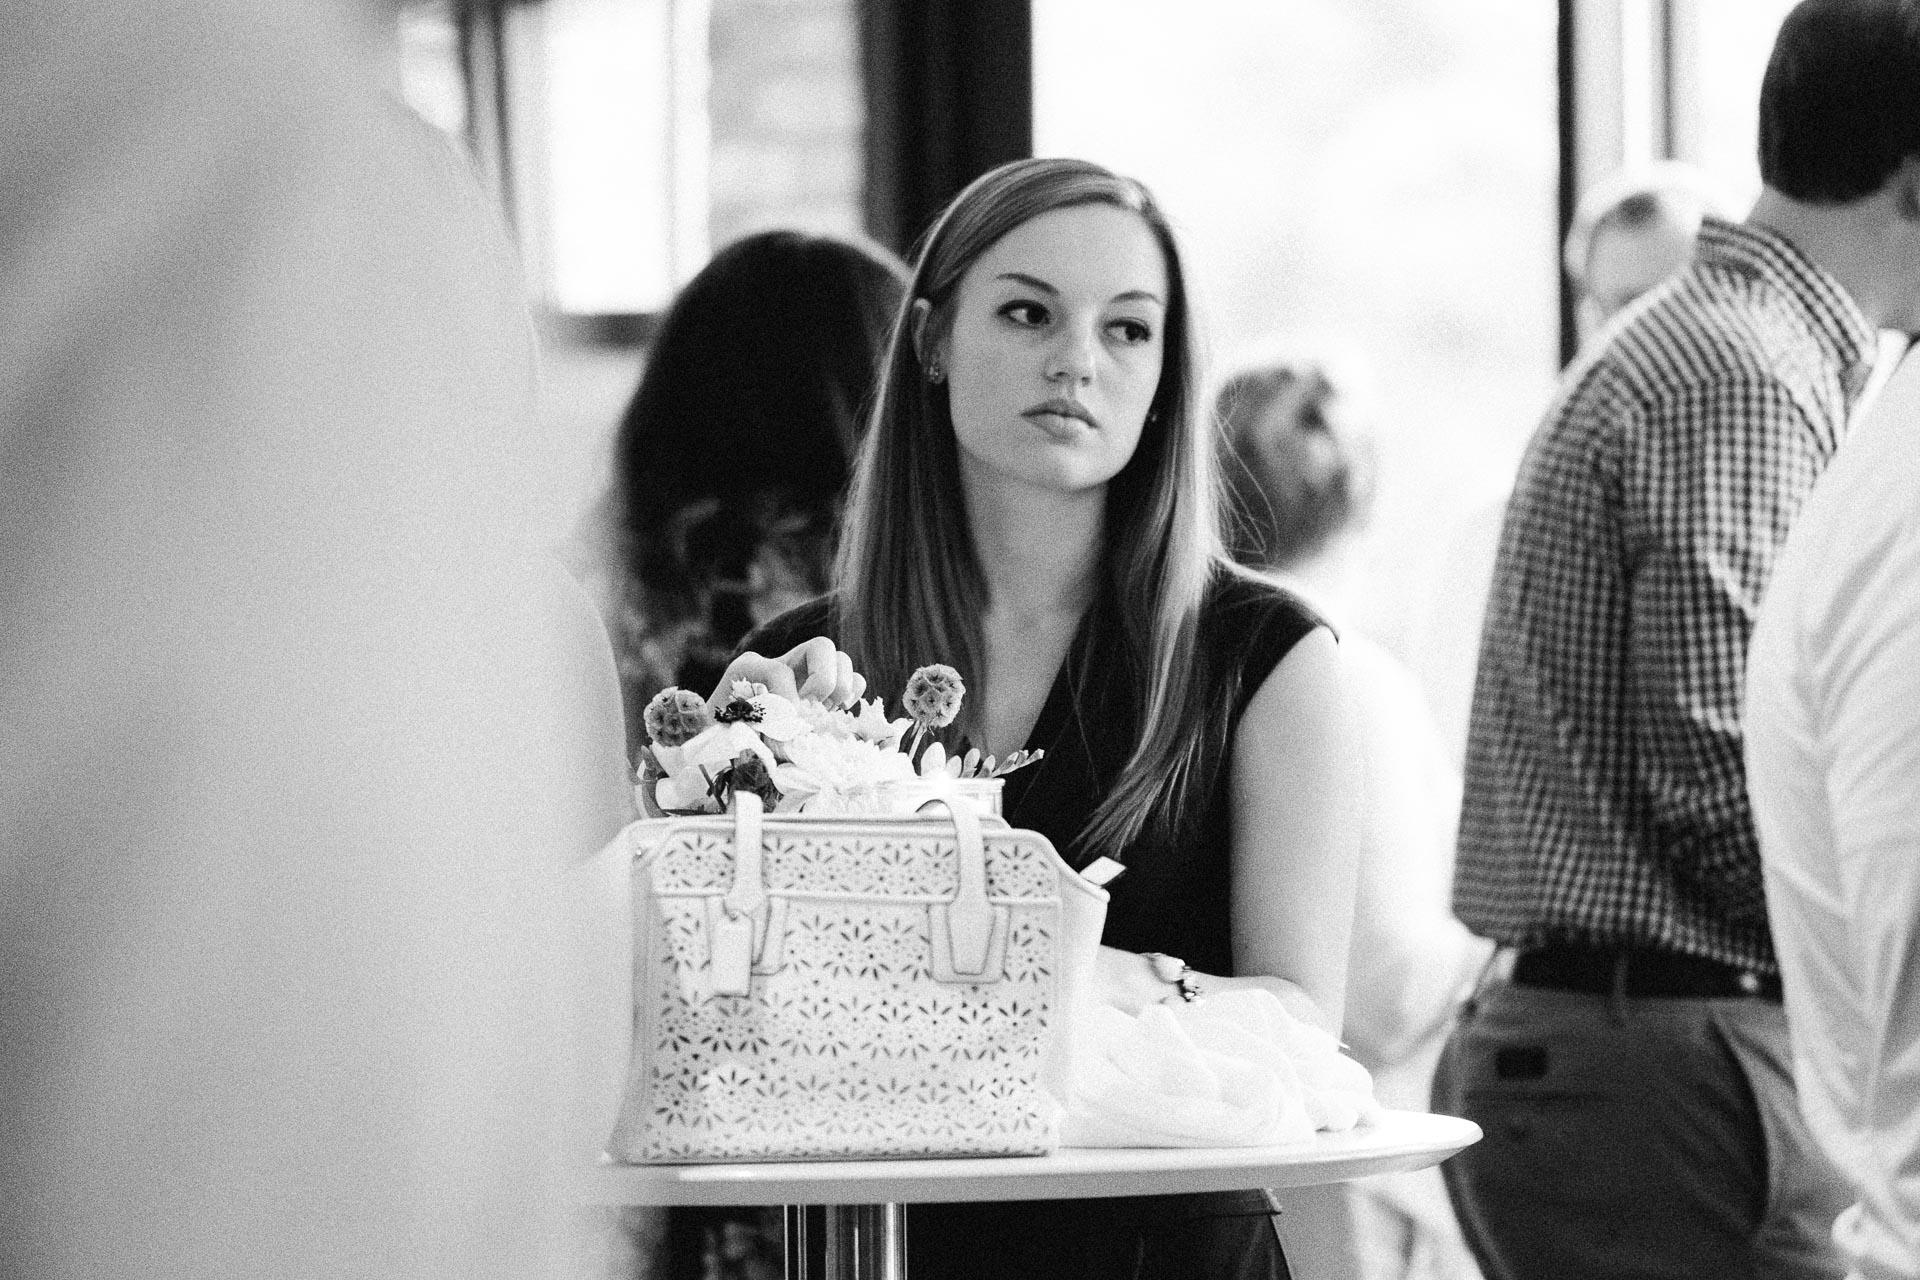 minneapolis-wedding-photographer-a-mill-artist-lofts0010